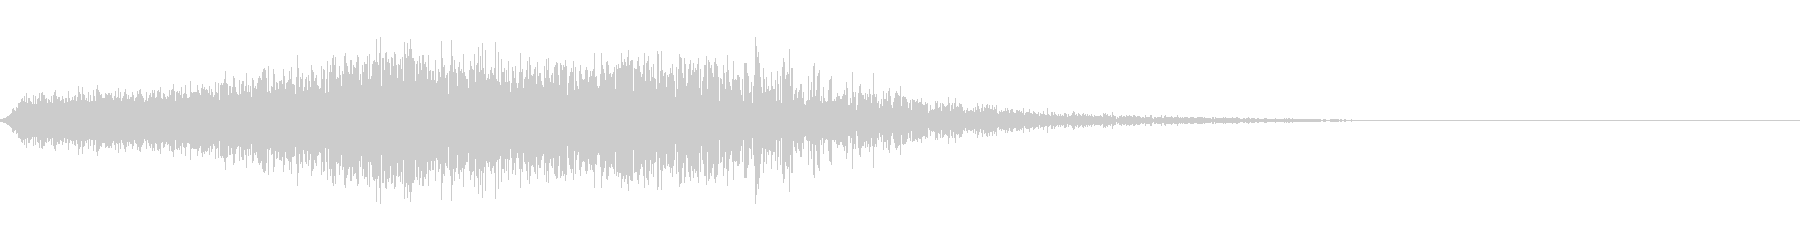 SF 移動音 8の未再生の波形